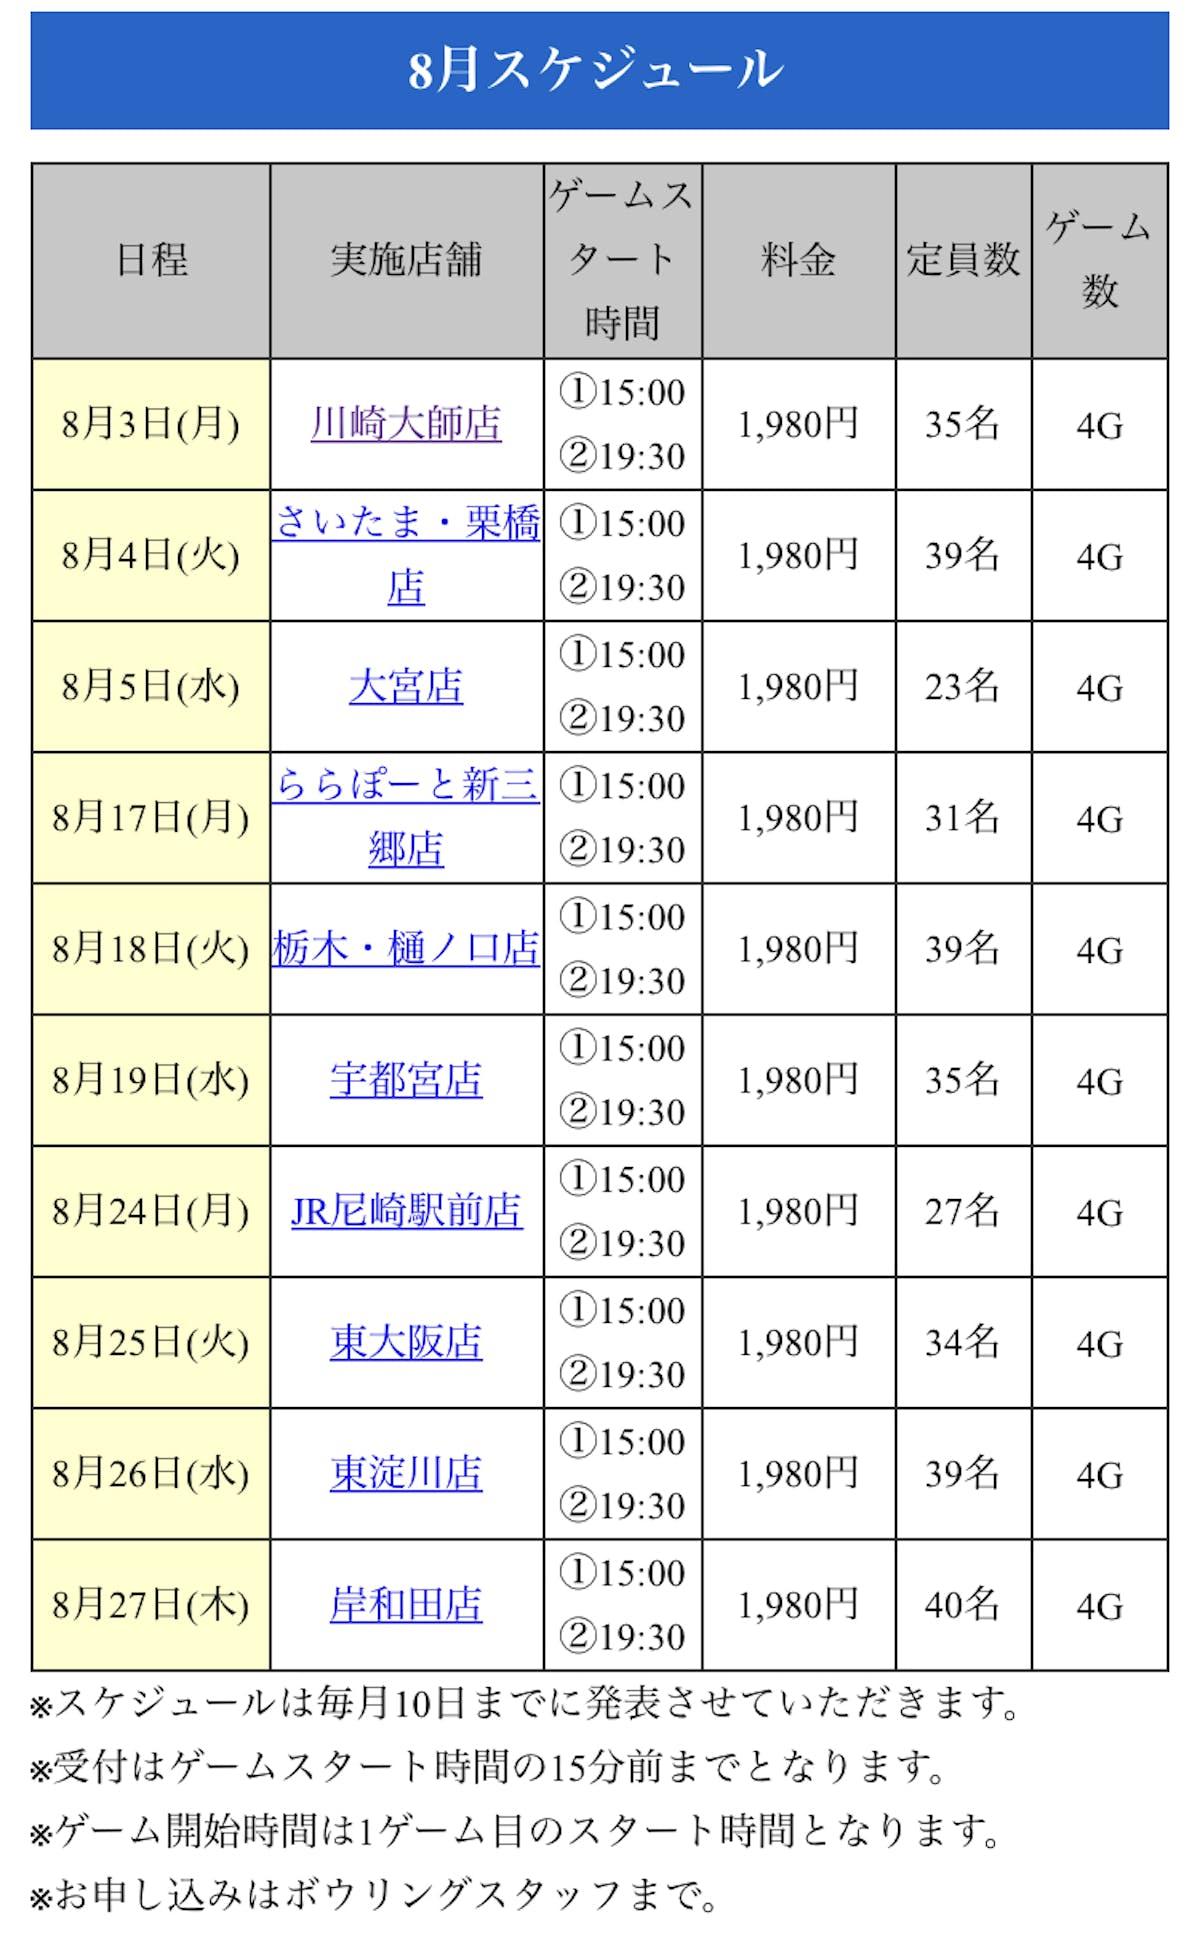 8C75373F-6C50-4B01-8129-784EB90D3485.jpeg